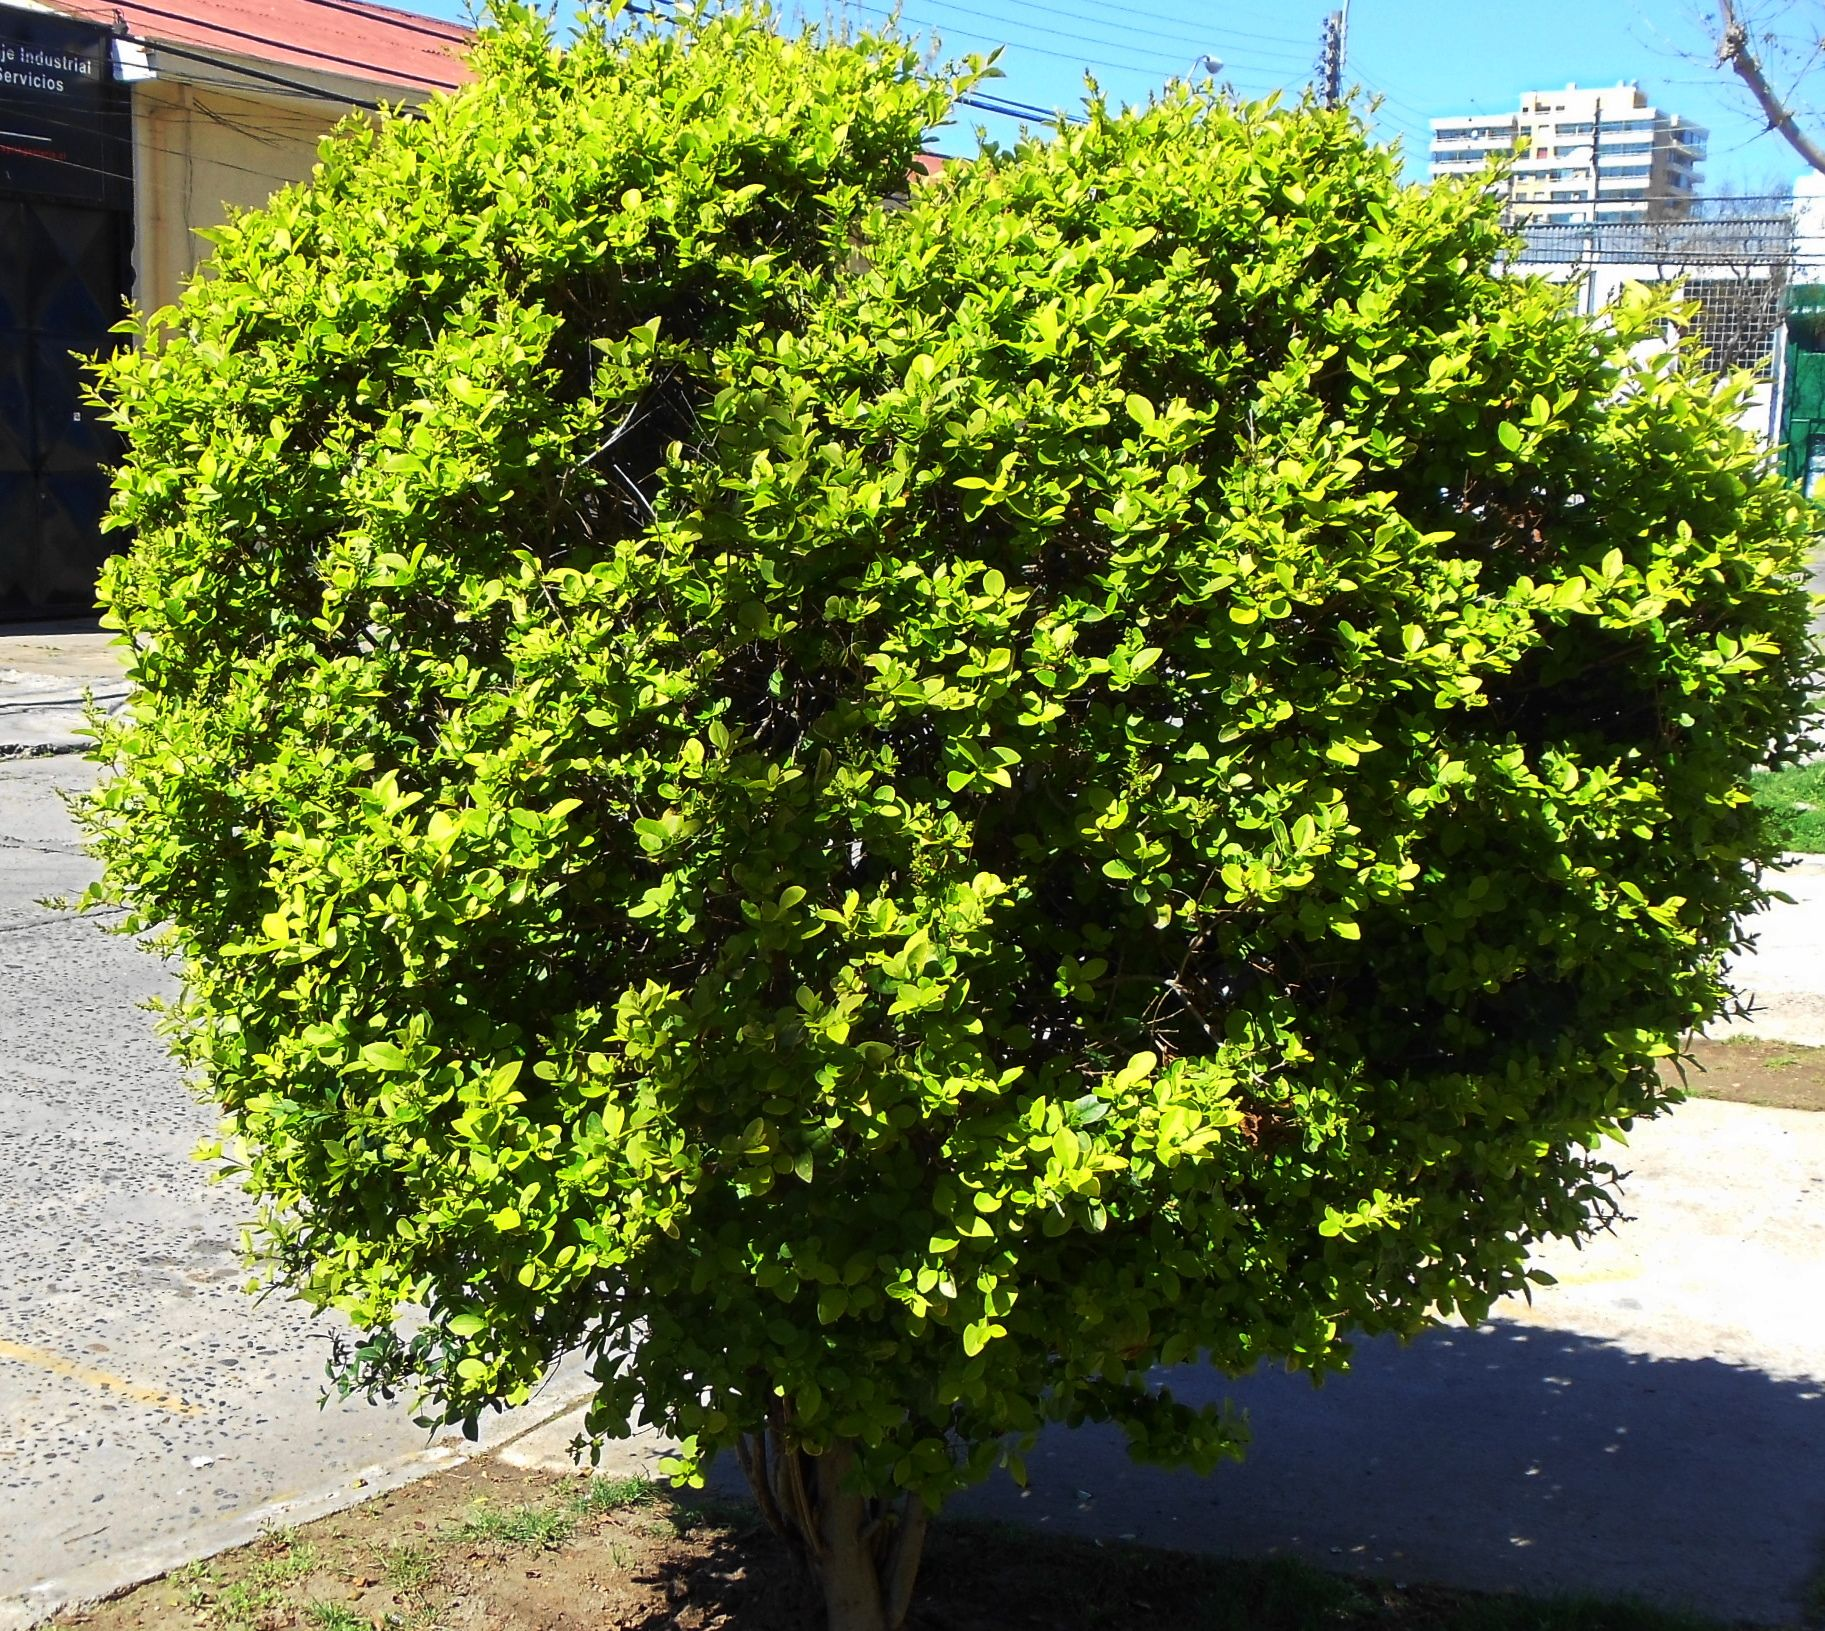 Arboles ornamentales de hoja perenne for Arboles ornamentales hoja perenne para jardin